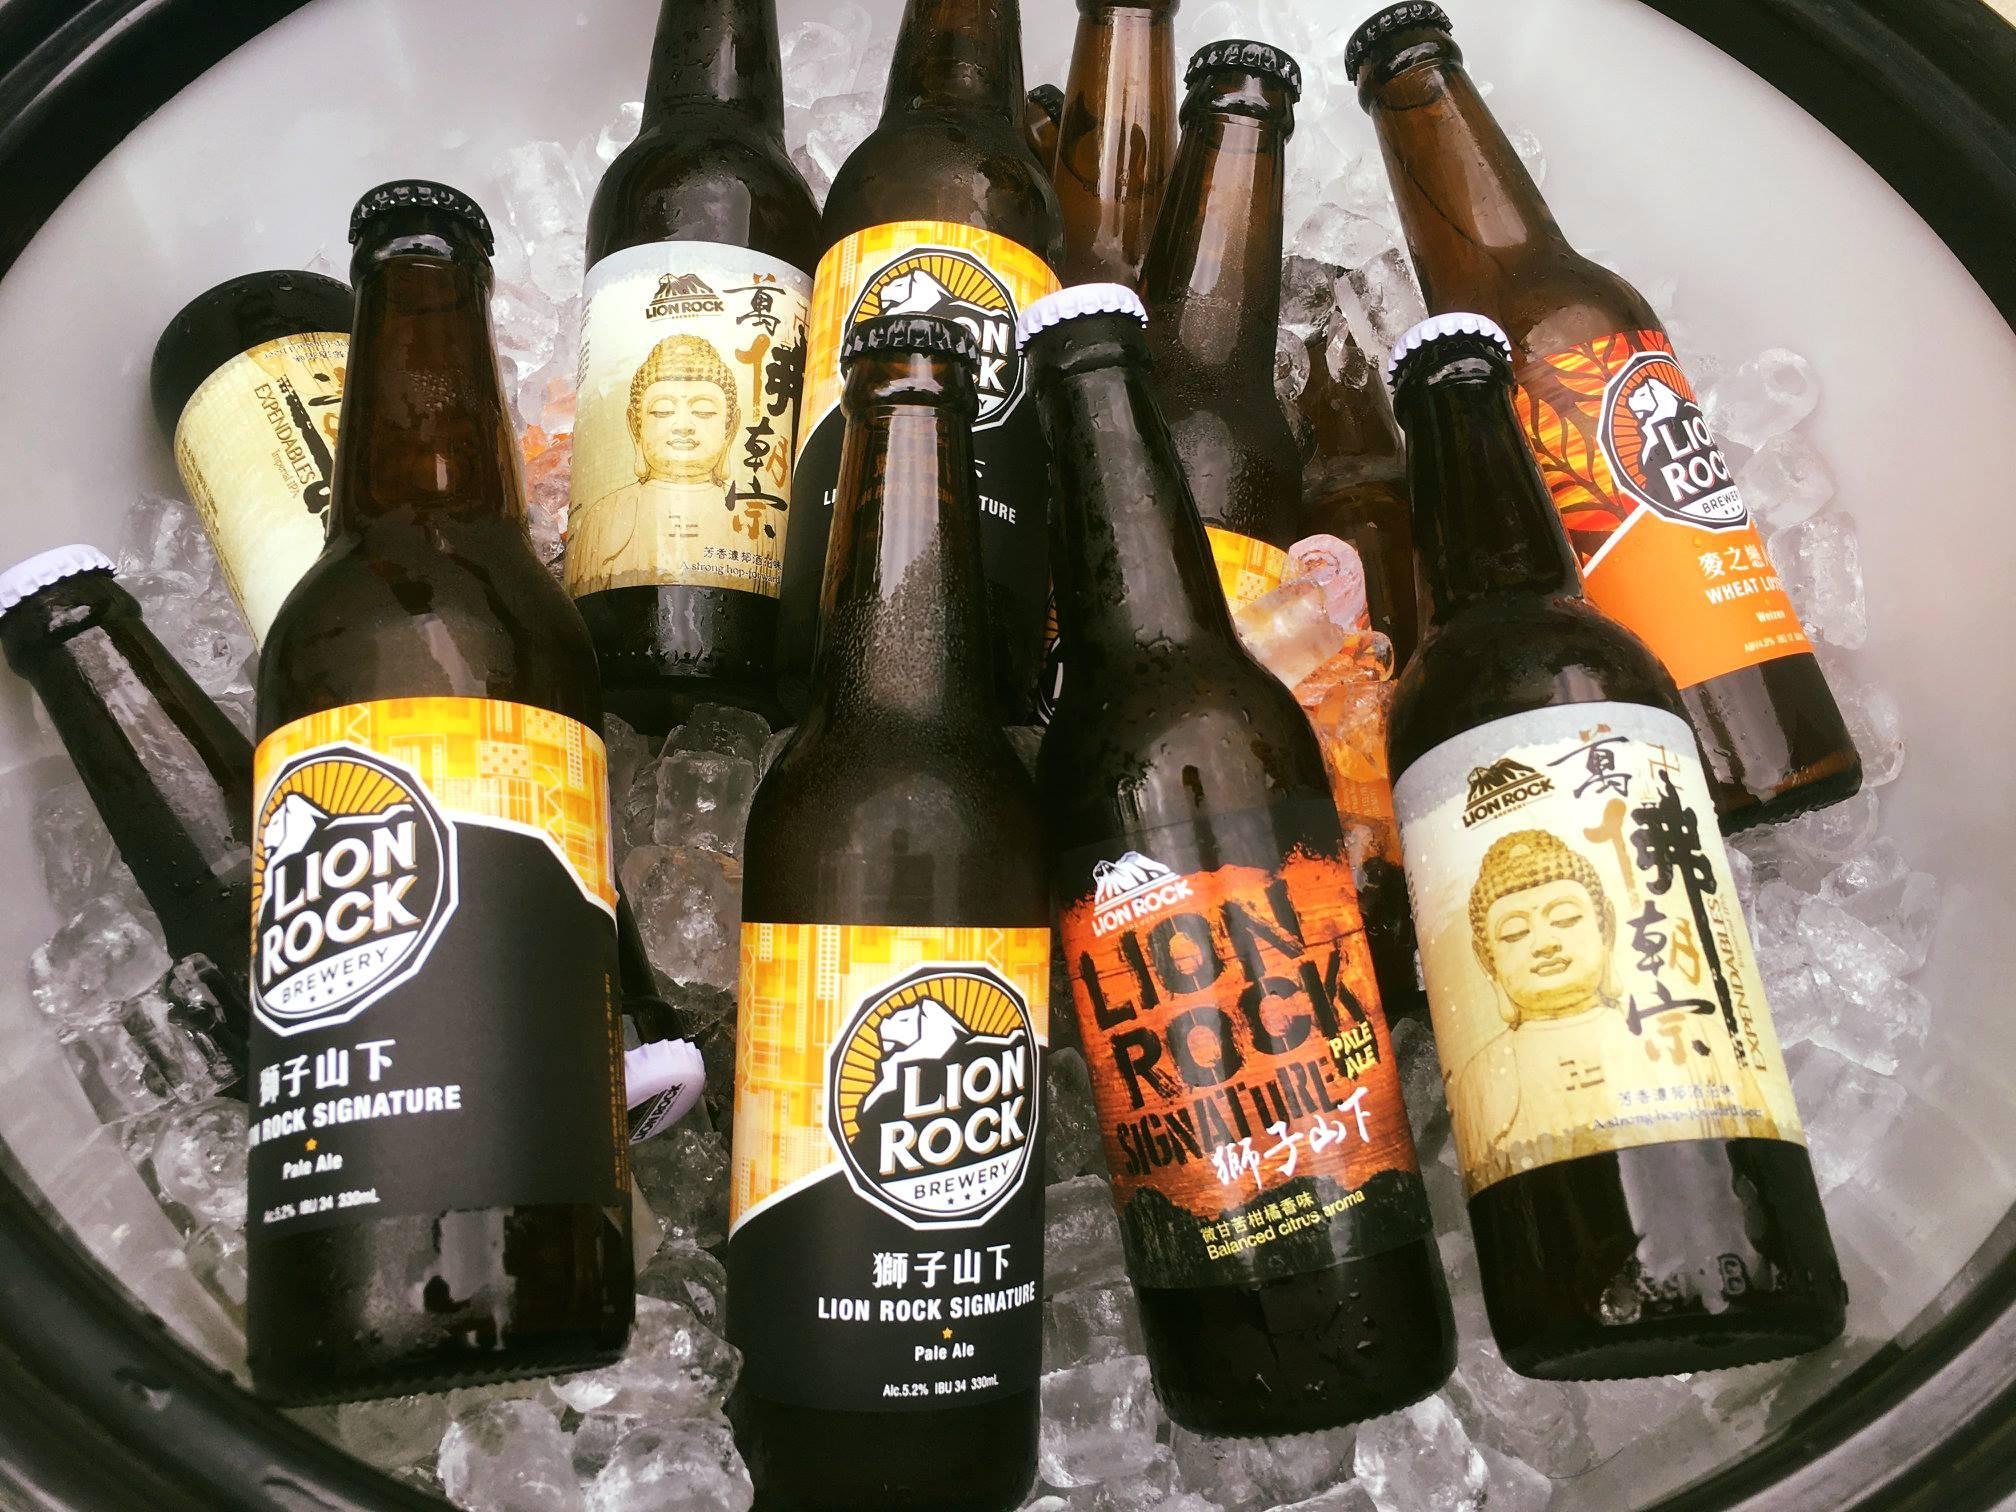 Lion Rock Brewery